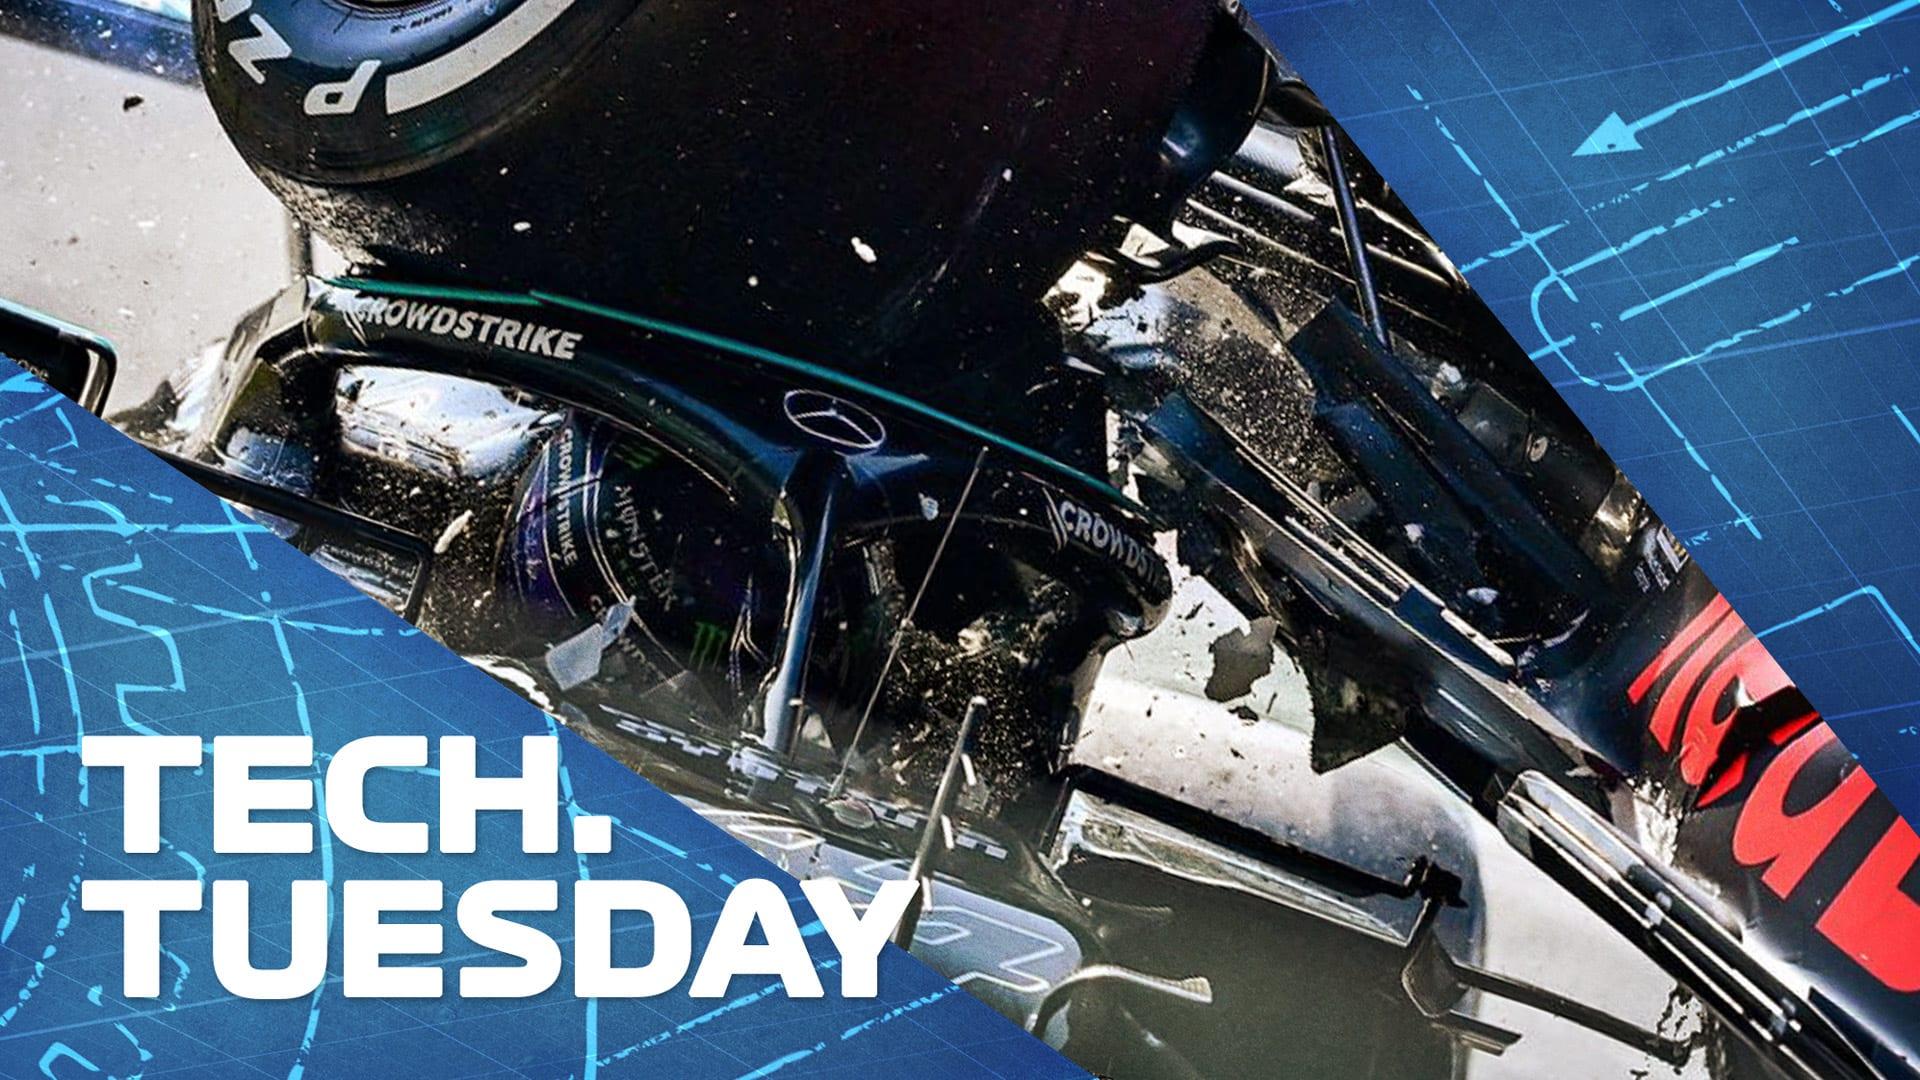 ITAcrashF1-Tech-Tuesday.jpg